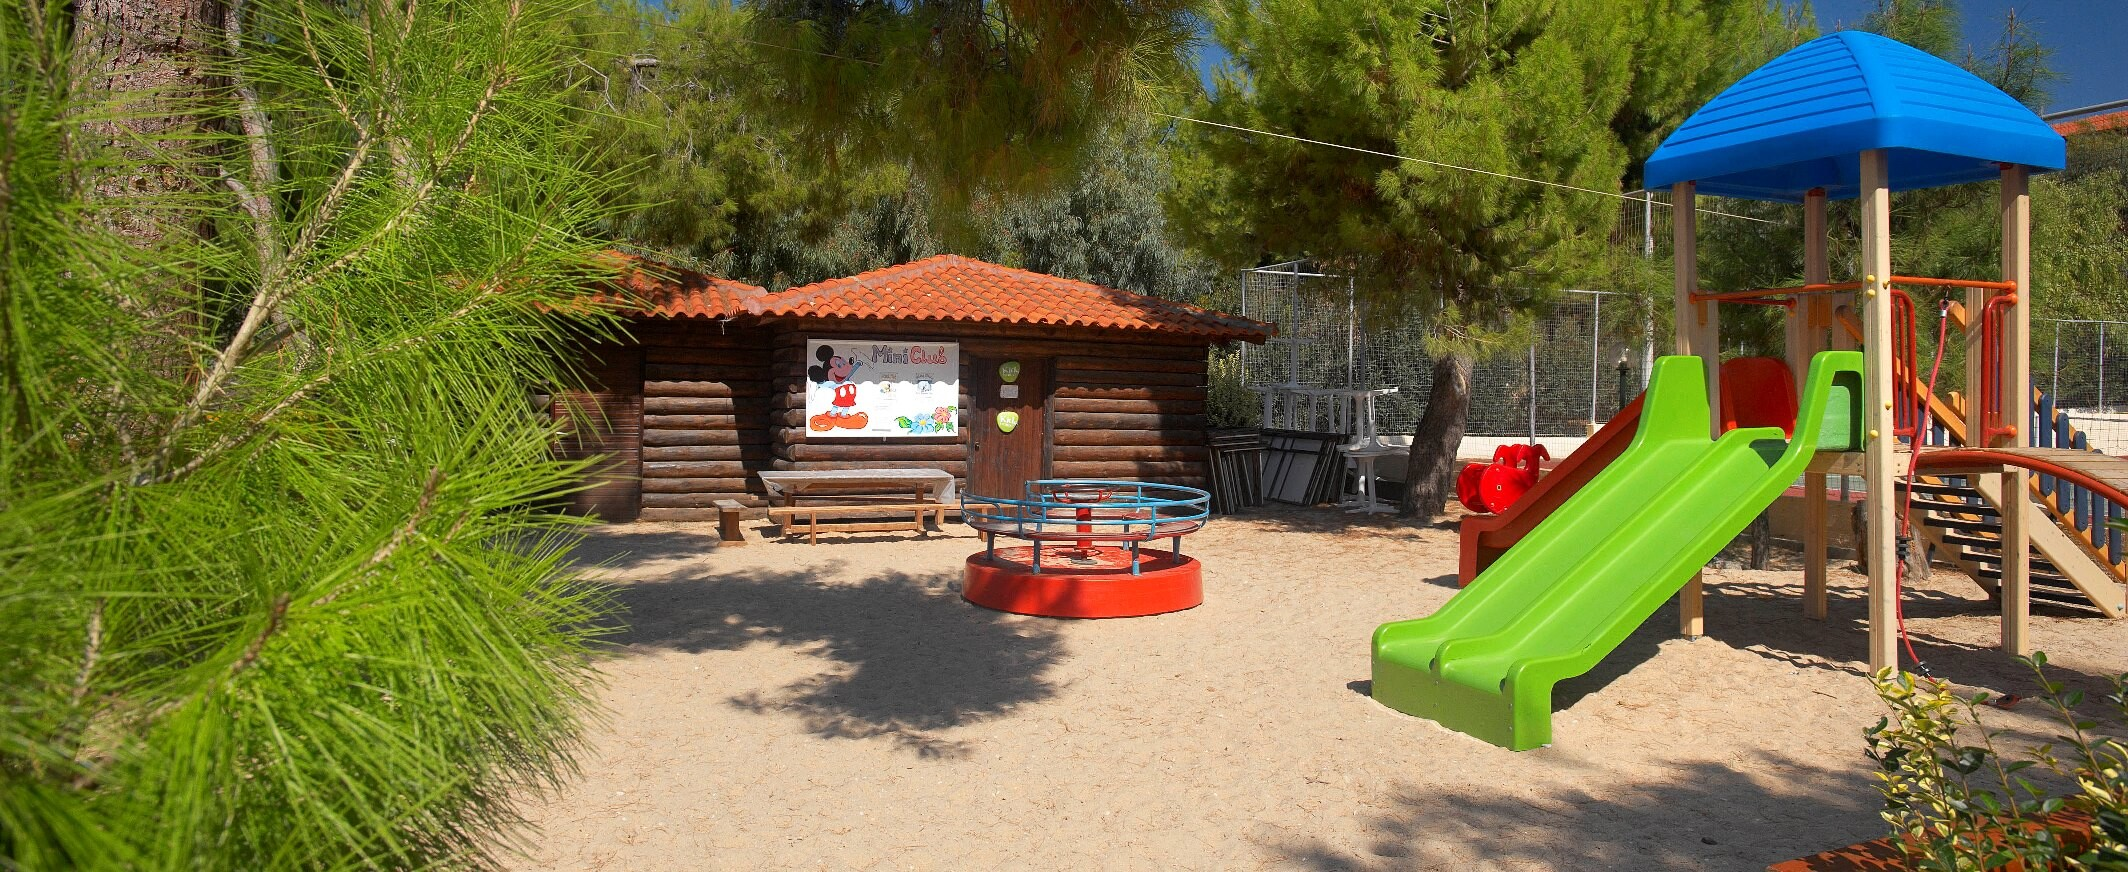 Portes Beach Hotel - мини клуб